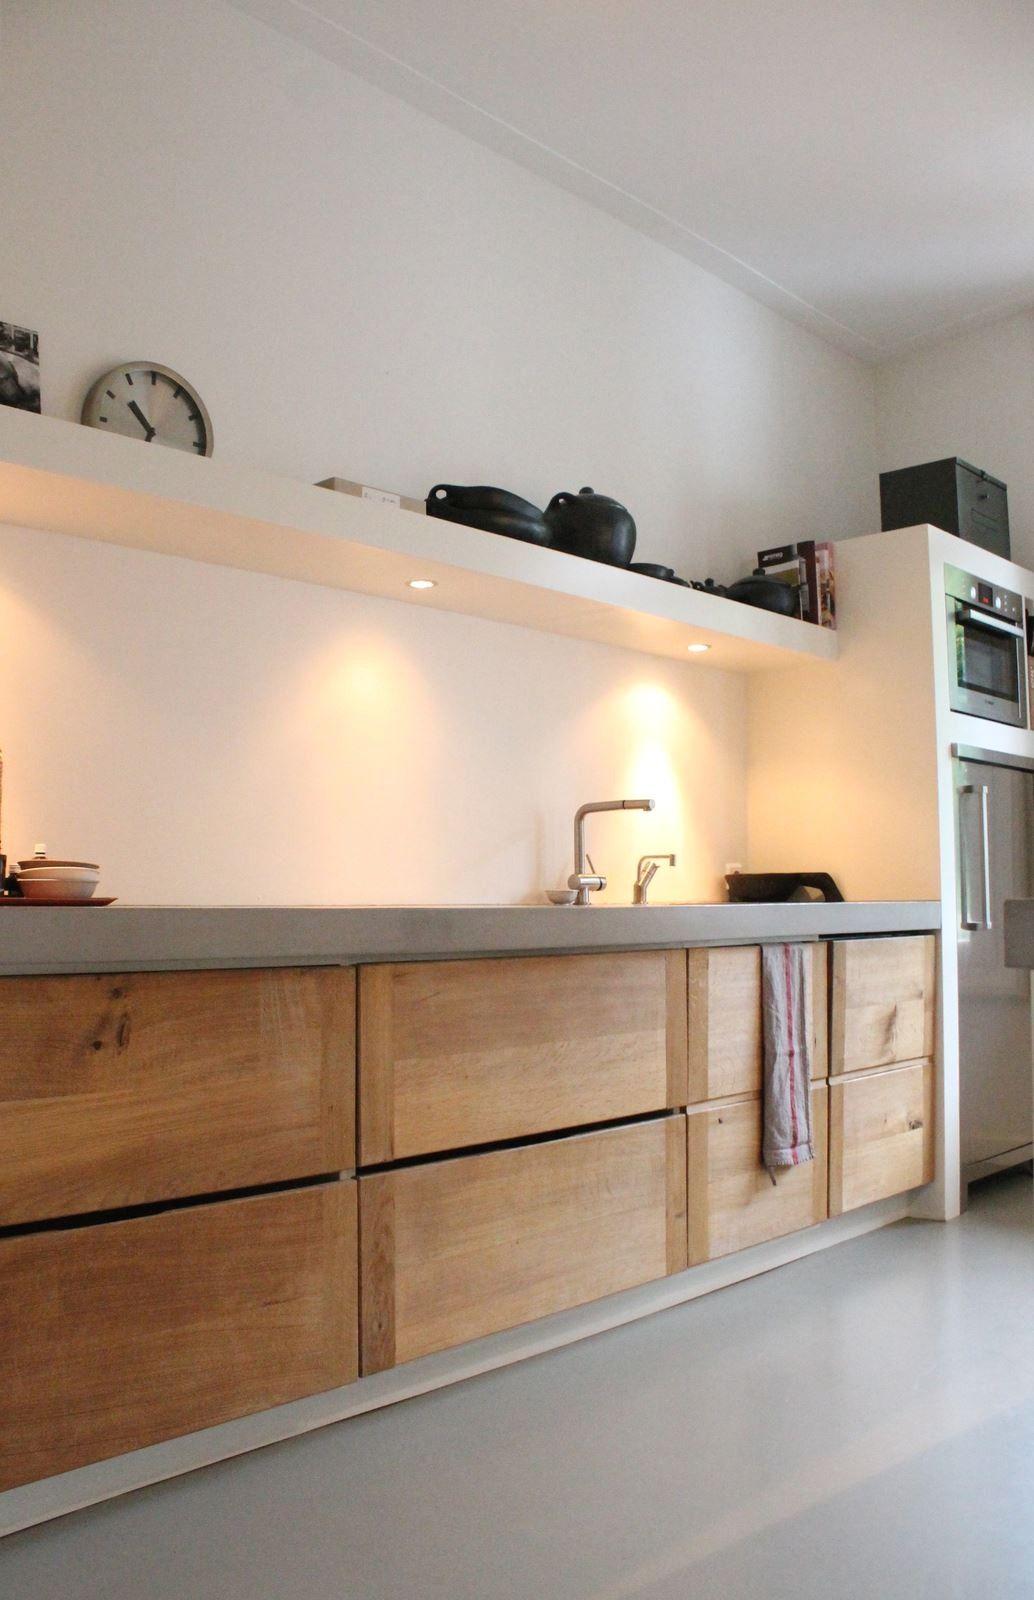 Risultati immagini per cucine in muratura | Arredamento ...